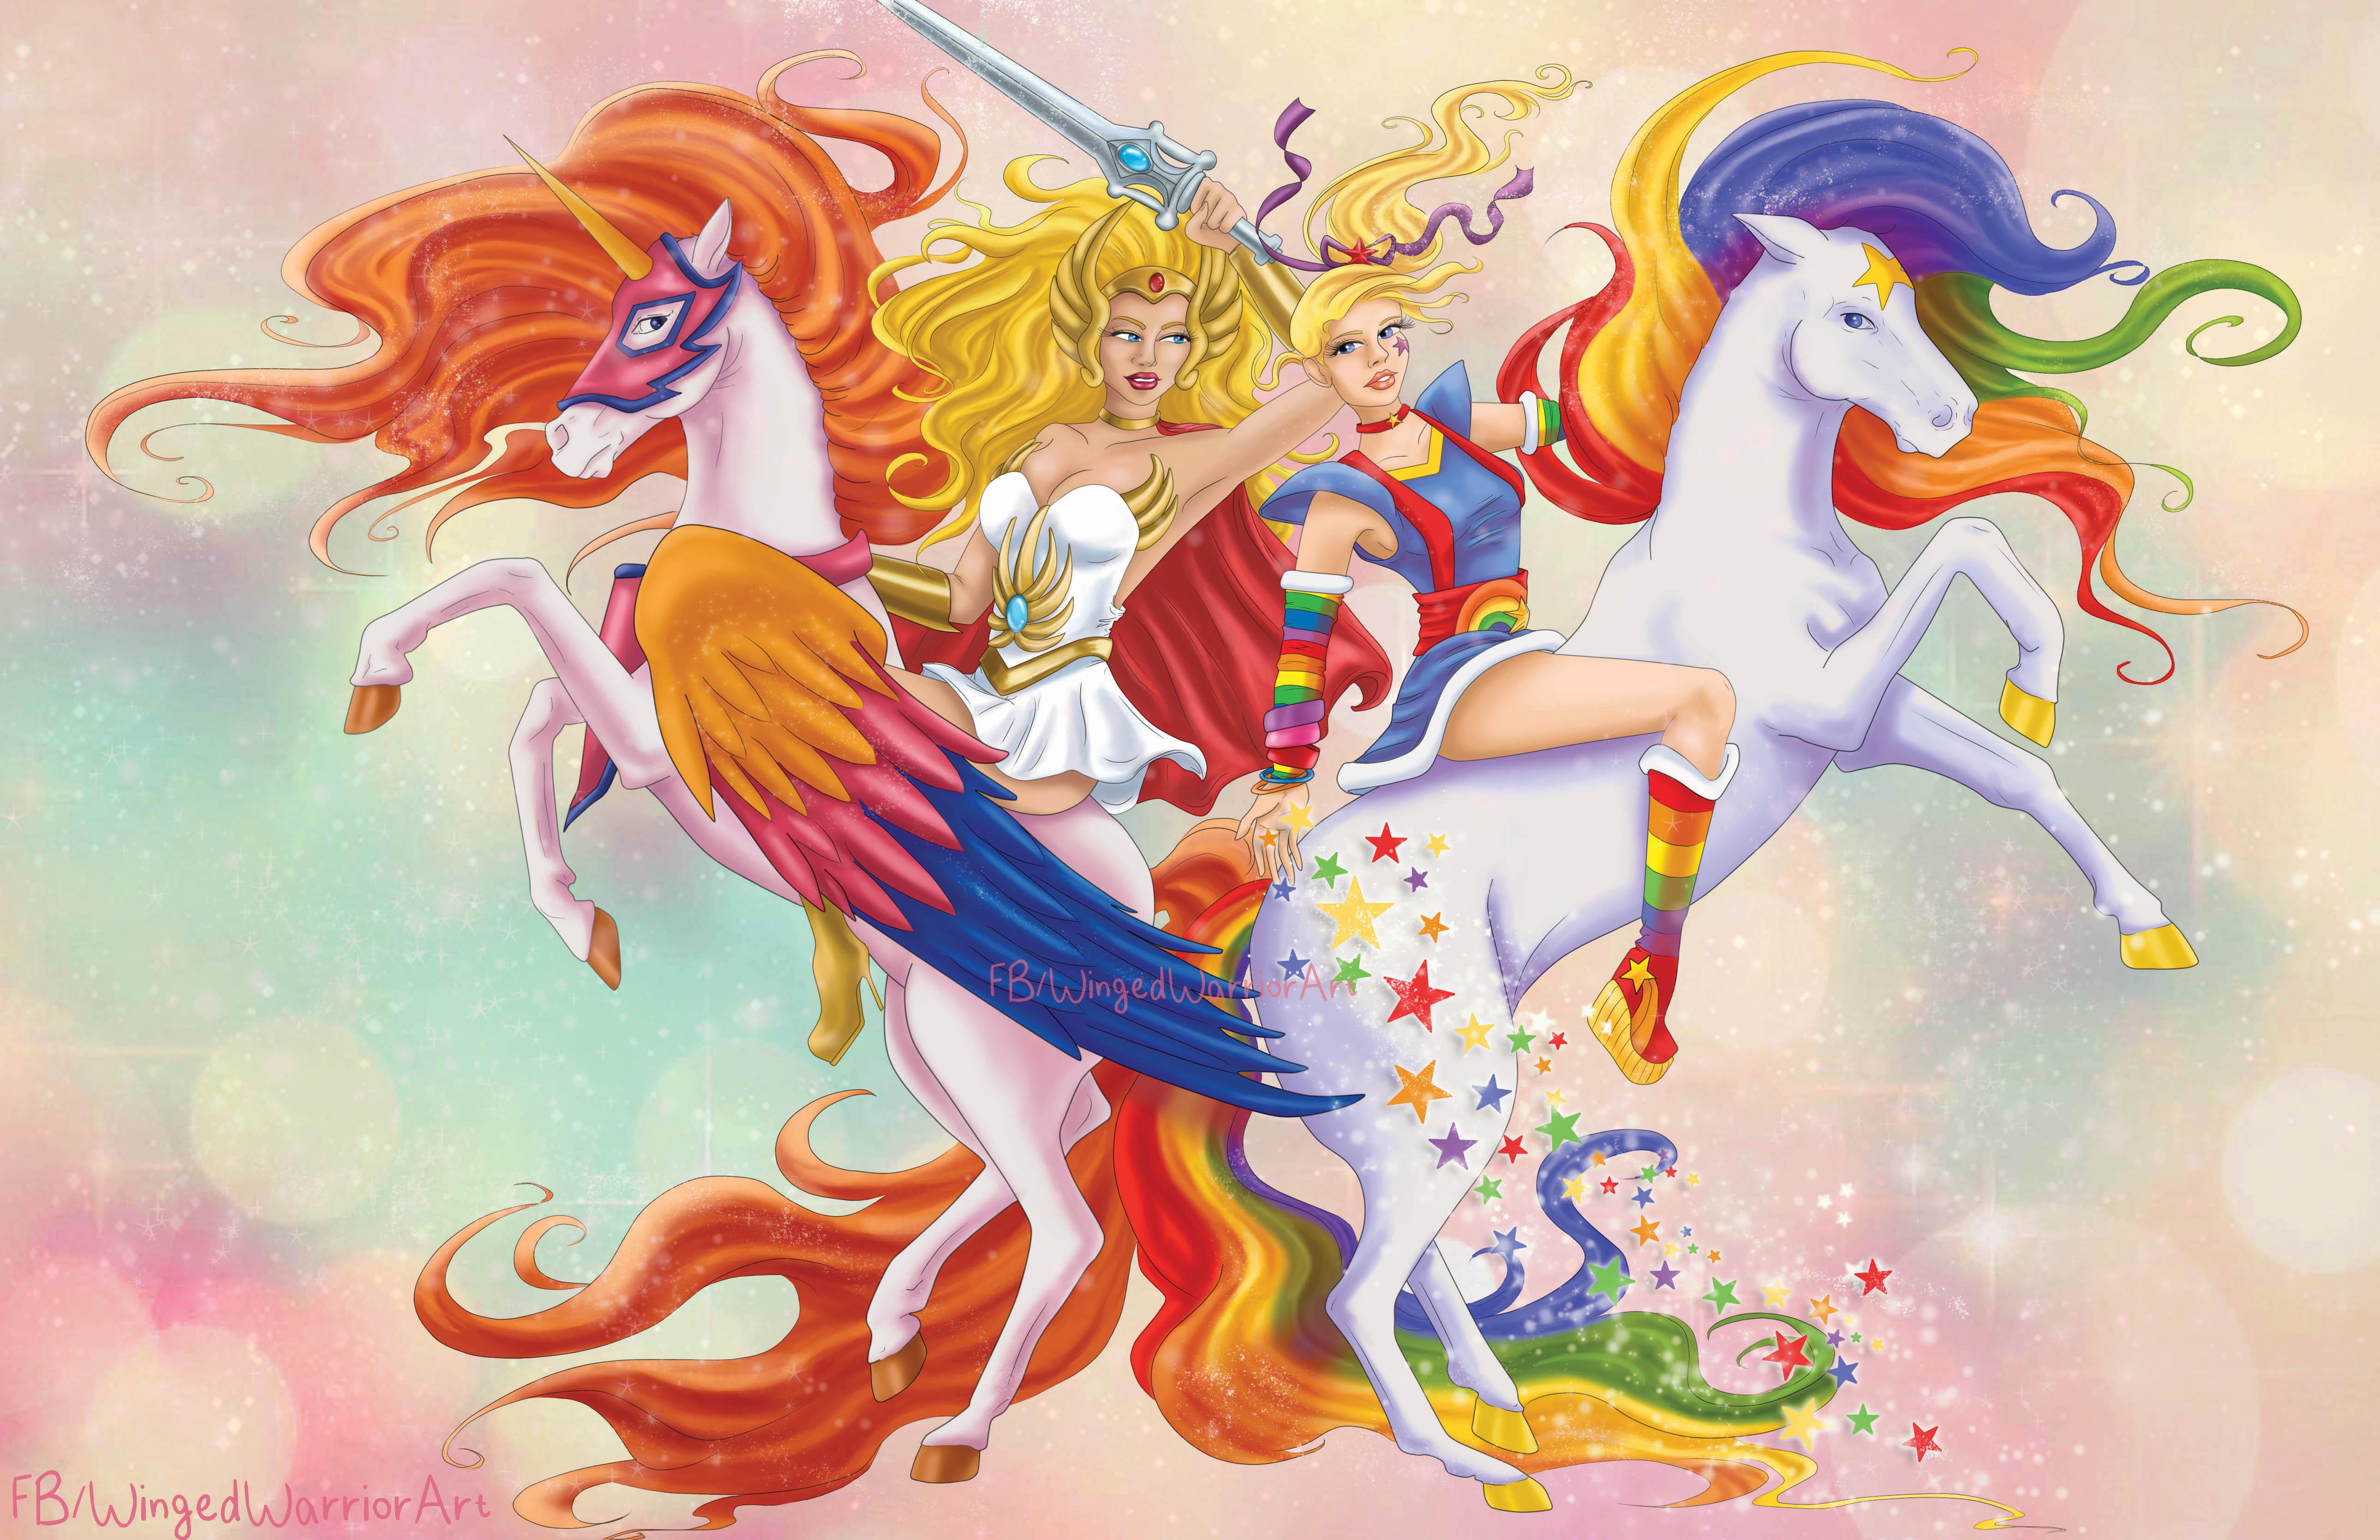 She-ra and Rainbow Brite 11x17 print on Storenvy